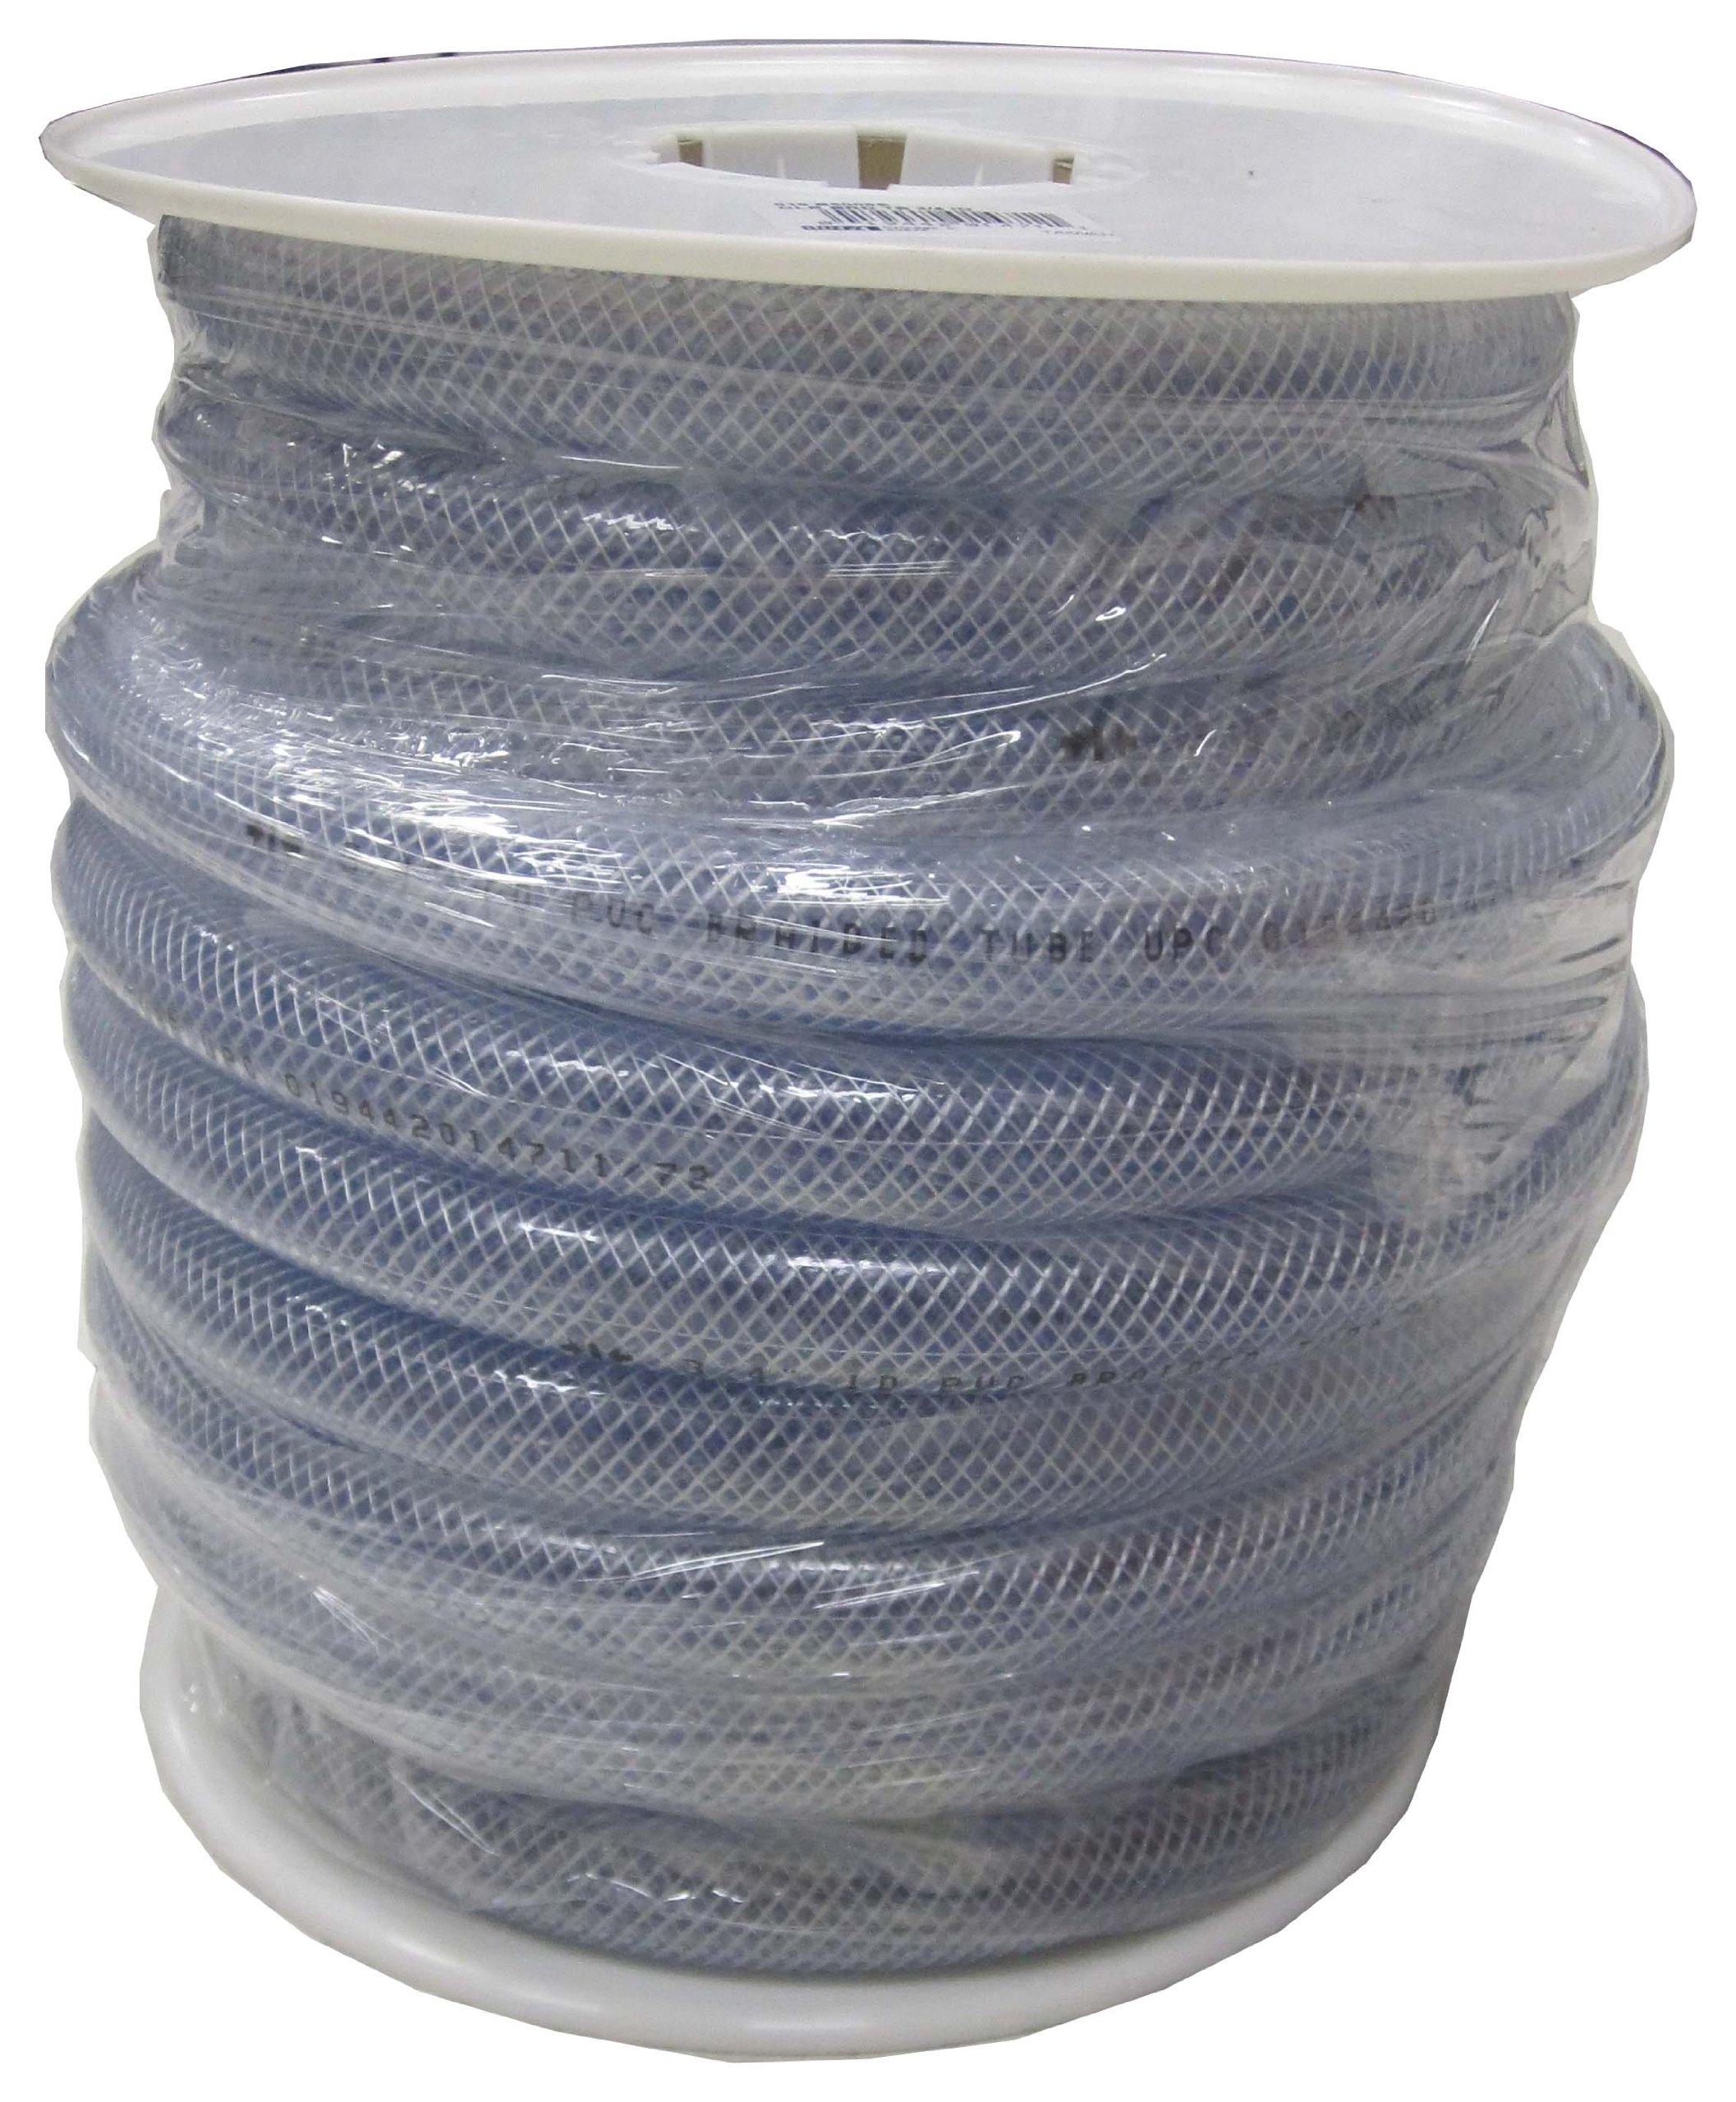 LDR 515 B5004S Braided Vinyl Hose Tubing, 5/8-Inch ID X 7/8-Inch OD, Clear, 75-Foot Spool by LDR Industries